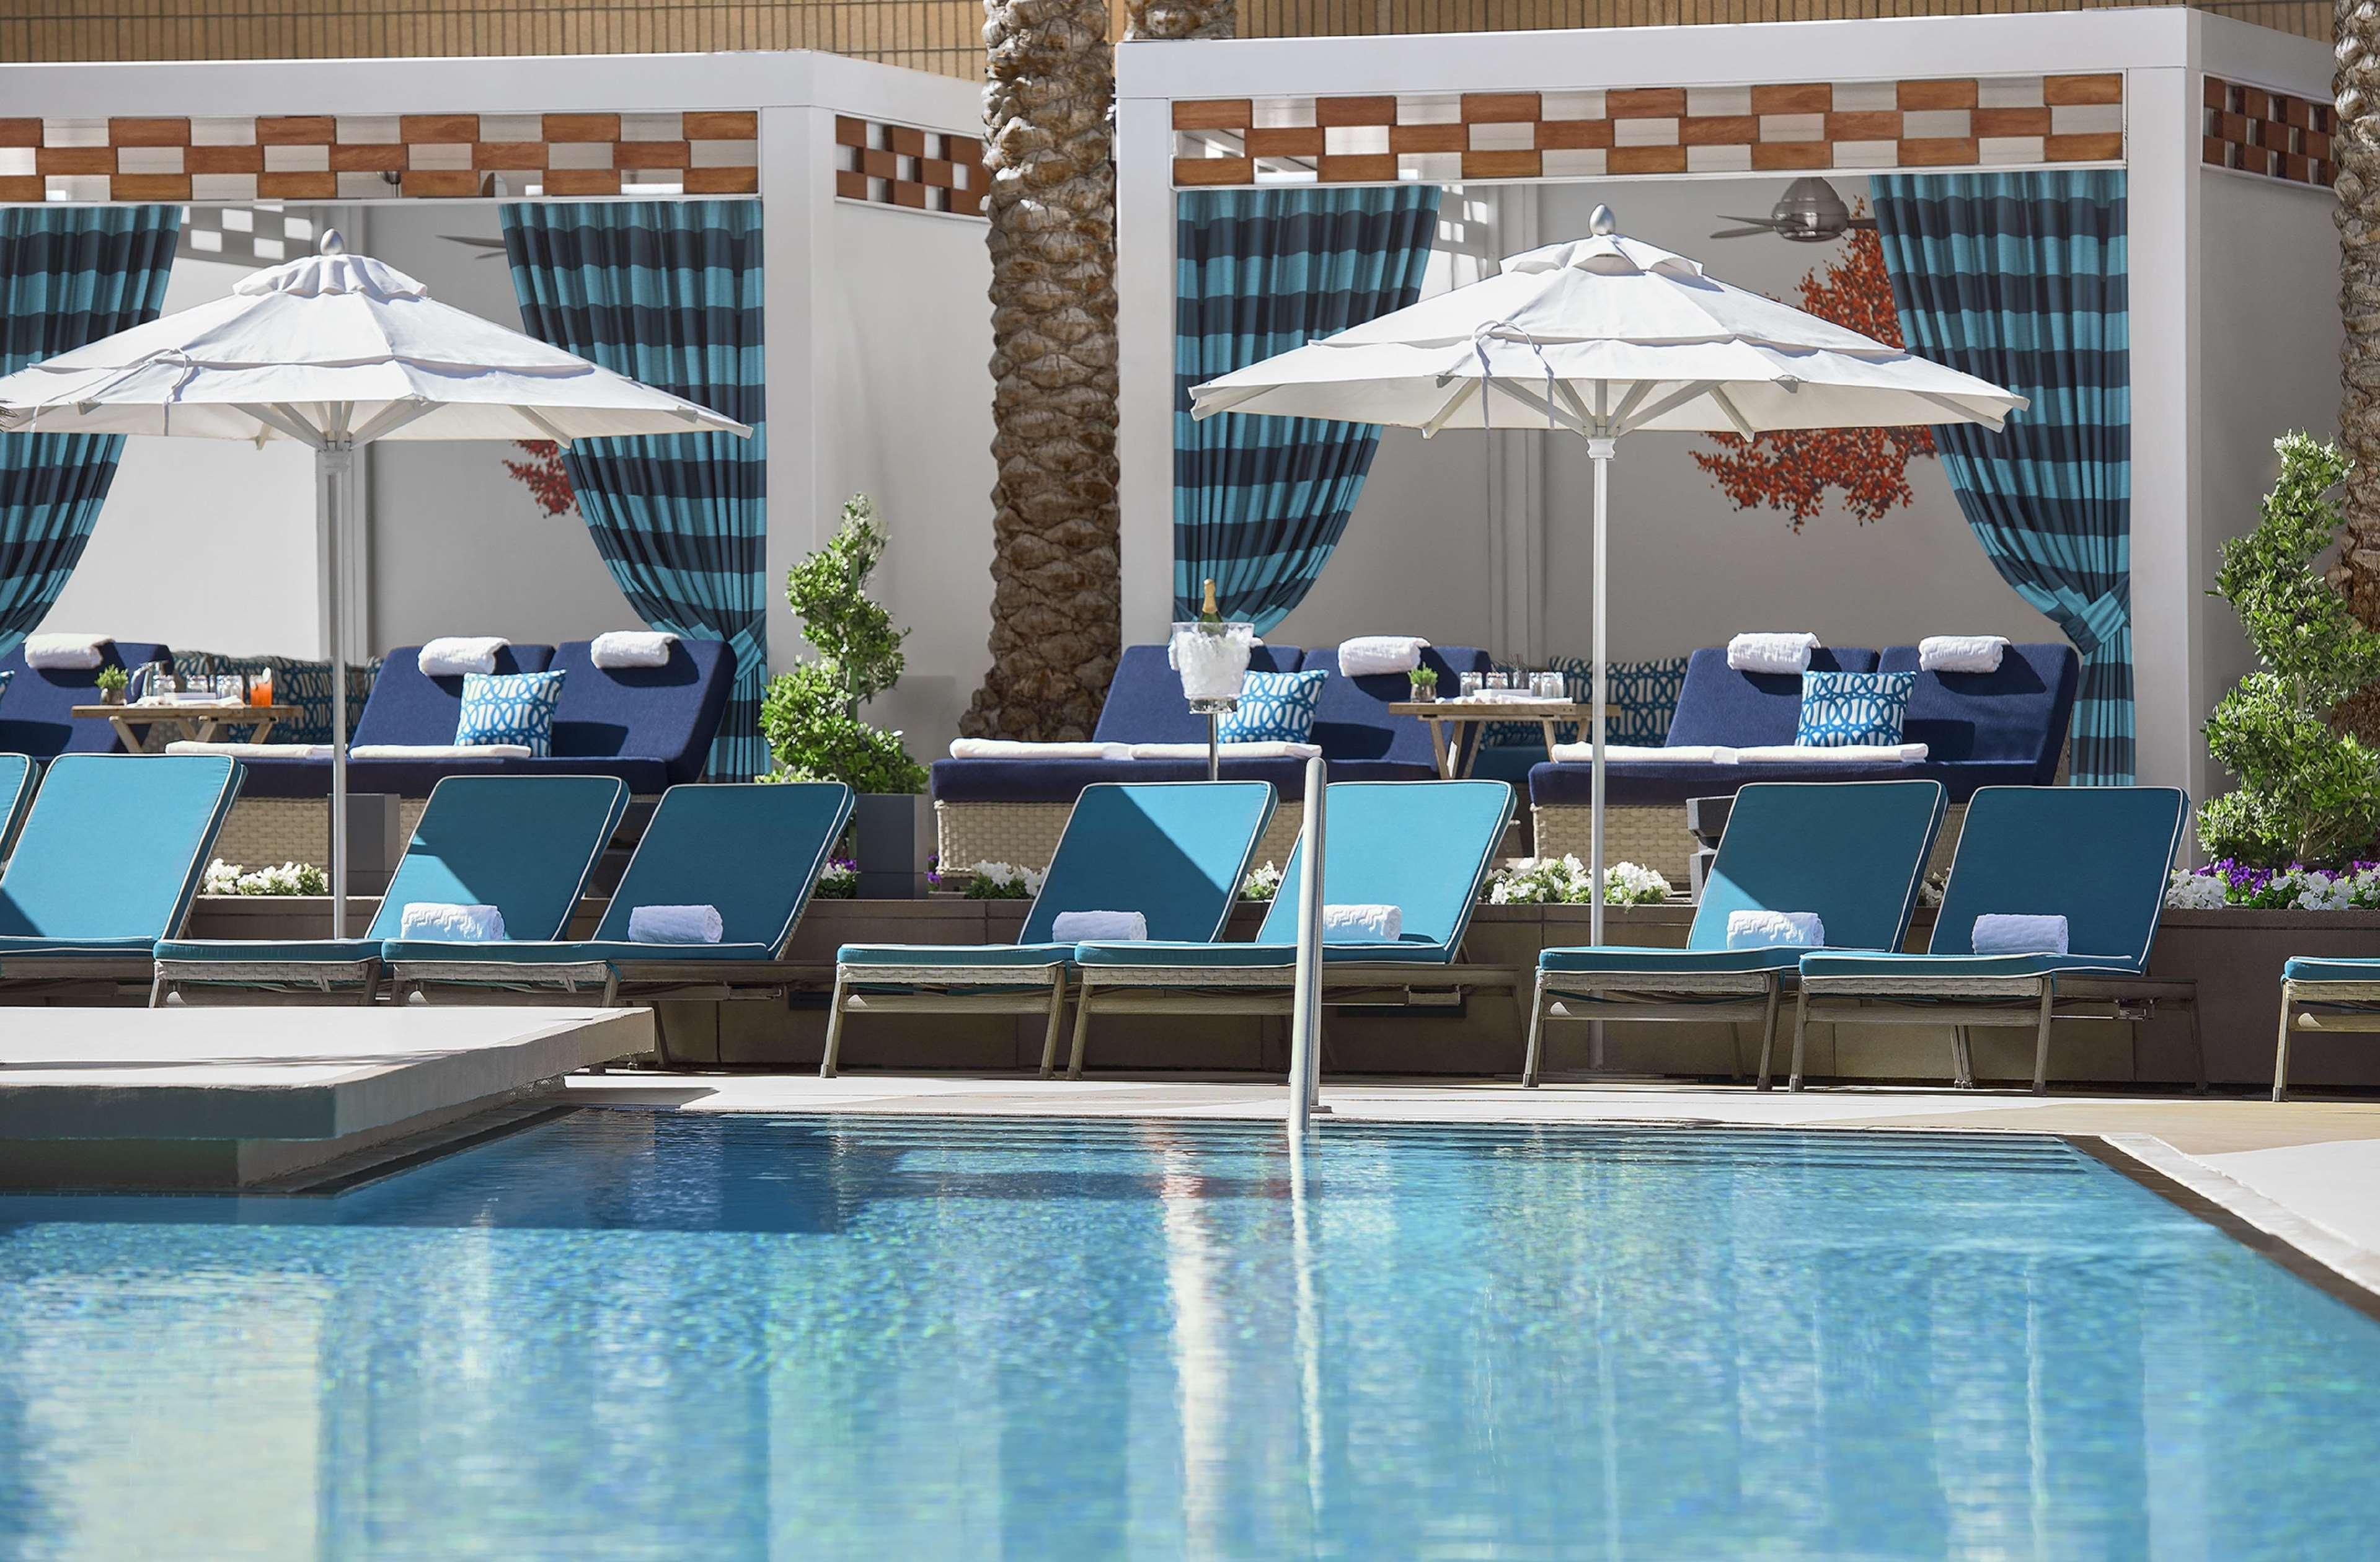 Waldorf Astoria Las Vegas image 9